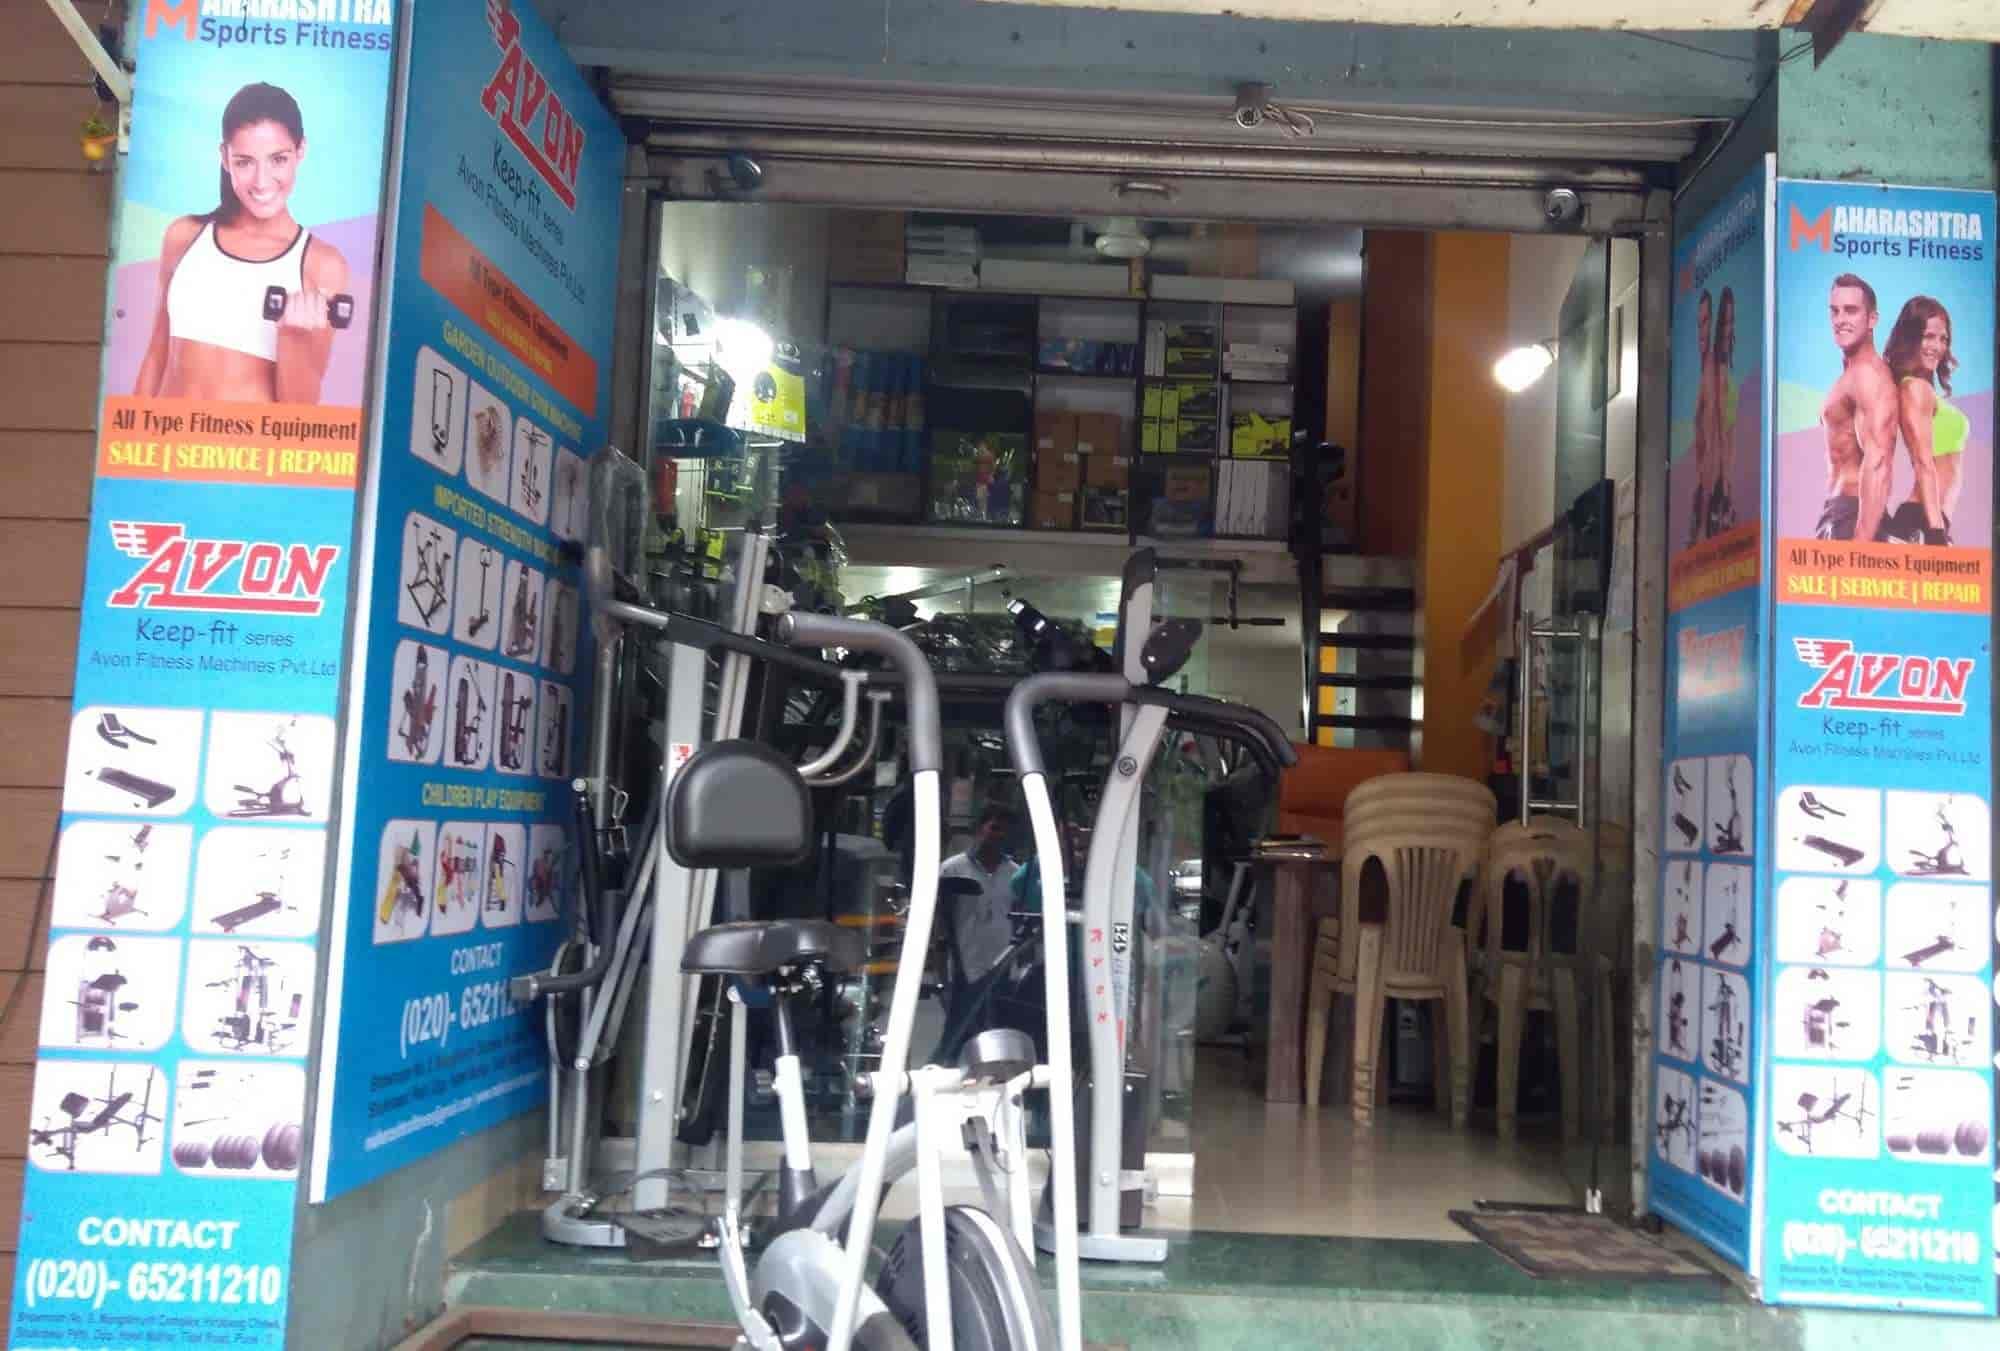 b0e1f74938e9 ... Motorized Treadmill, Cross Trainer, Elliptical, Bike, Cycle Spin Bike  Home Gym Multi ...